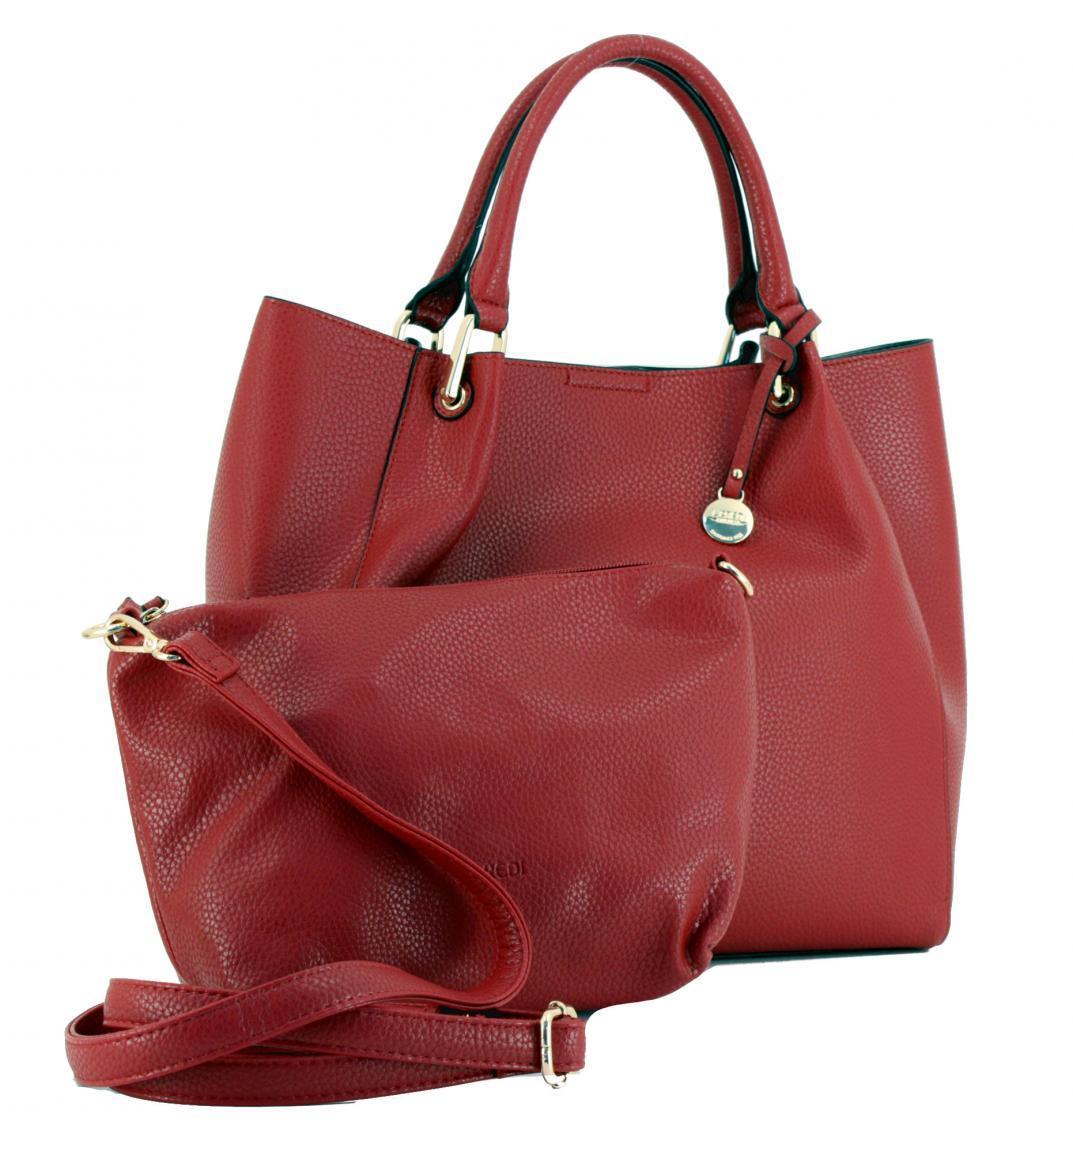 Handtasche Belinda L. Credi Umhängeriemen rot